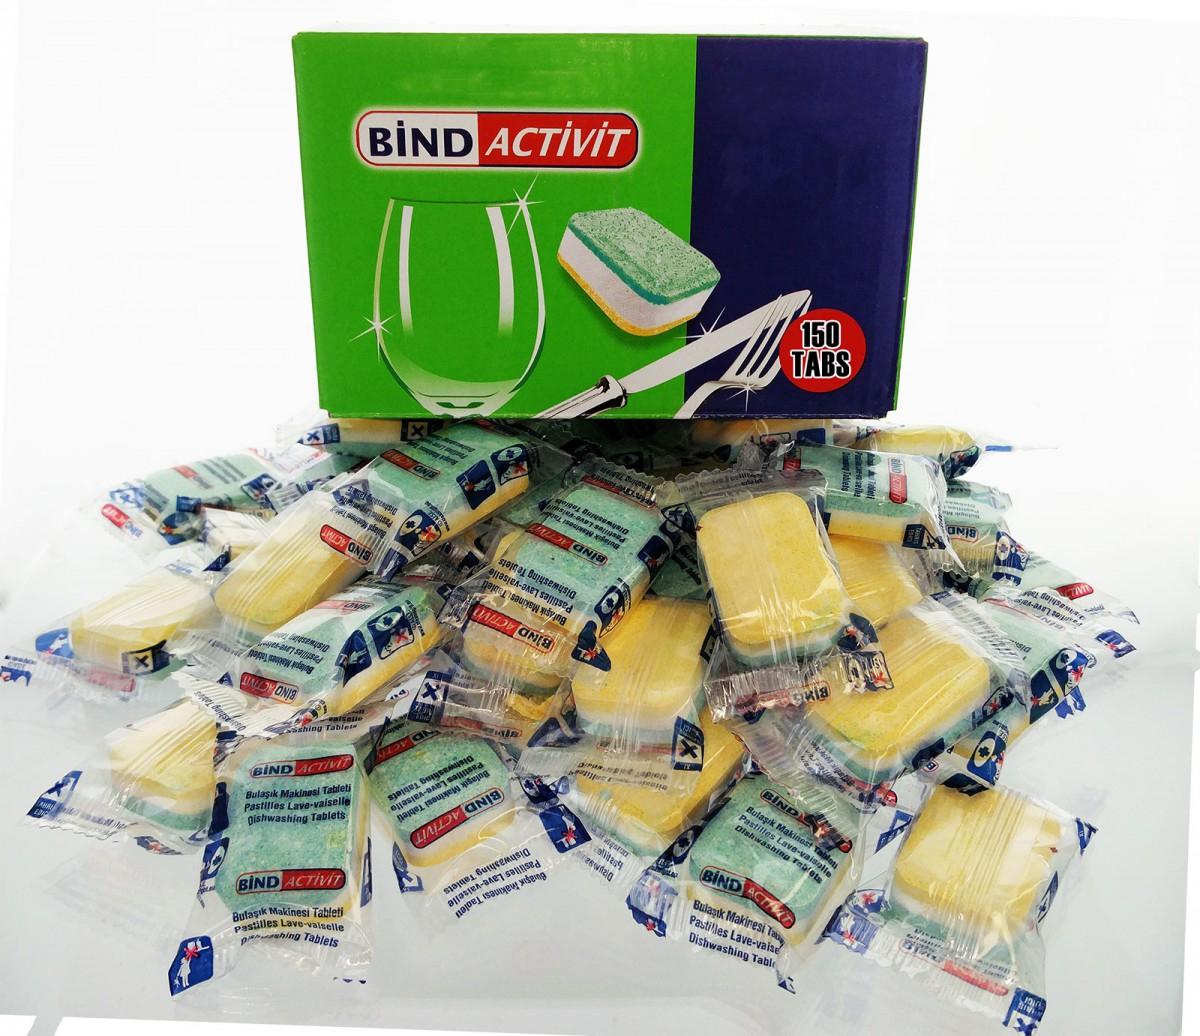 Bind Activit Spülmaschinentabs (0,04€) pro Stück 12x 50er Pack für 22,12 € + Versand bei Top12.de